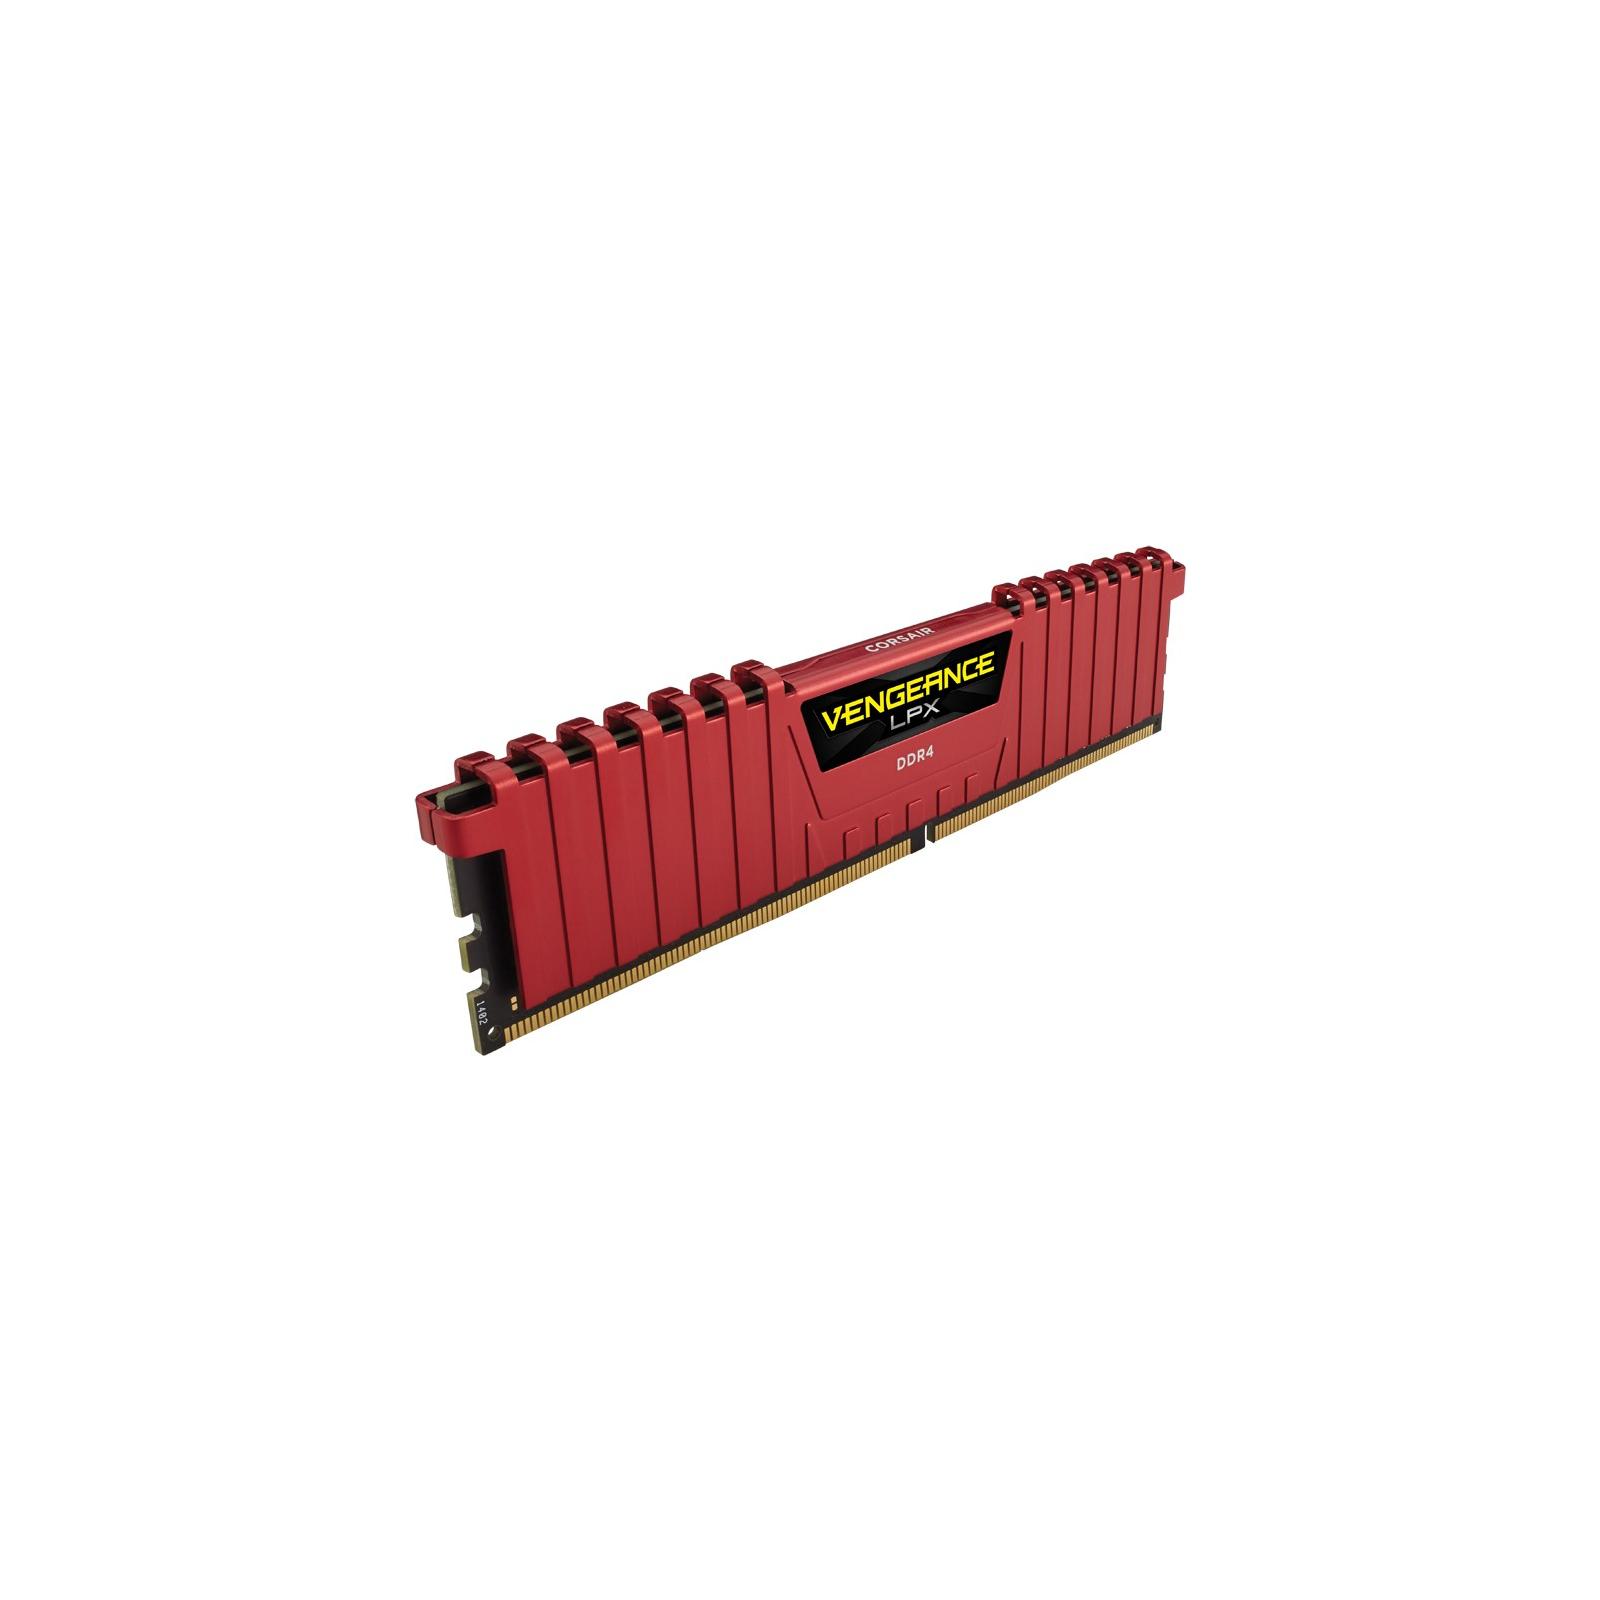 Модуль памяти для компьютера DDR4 8GB 2666 MHz Vengeance LPX Red CORSAIR (CMK8GX4M1A2666C16R) изображение 3